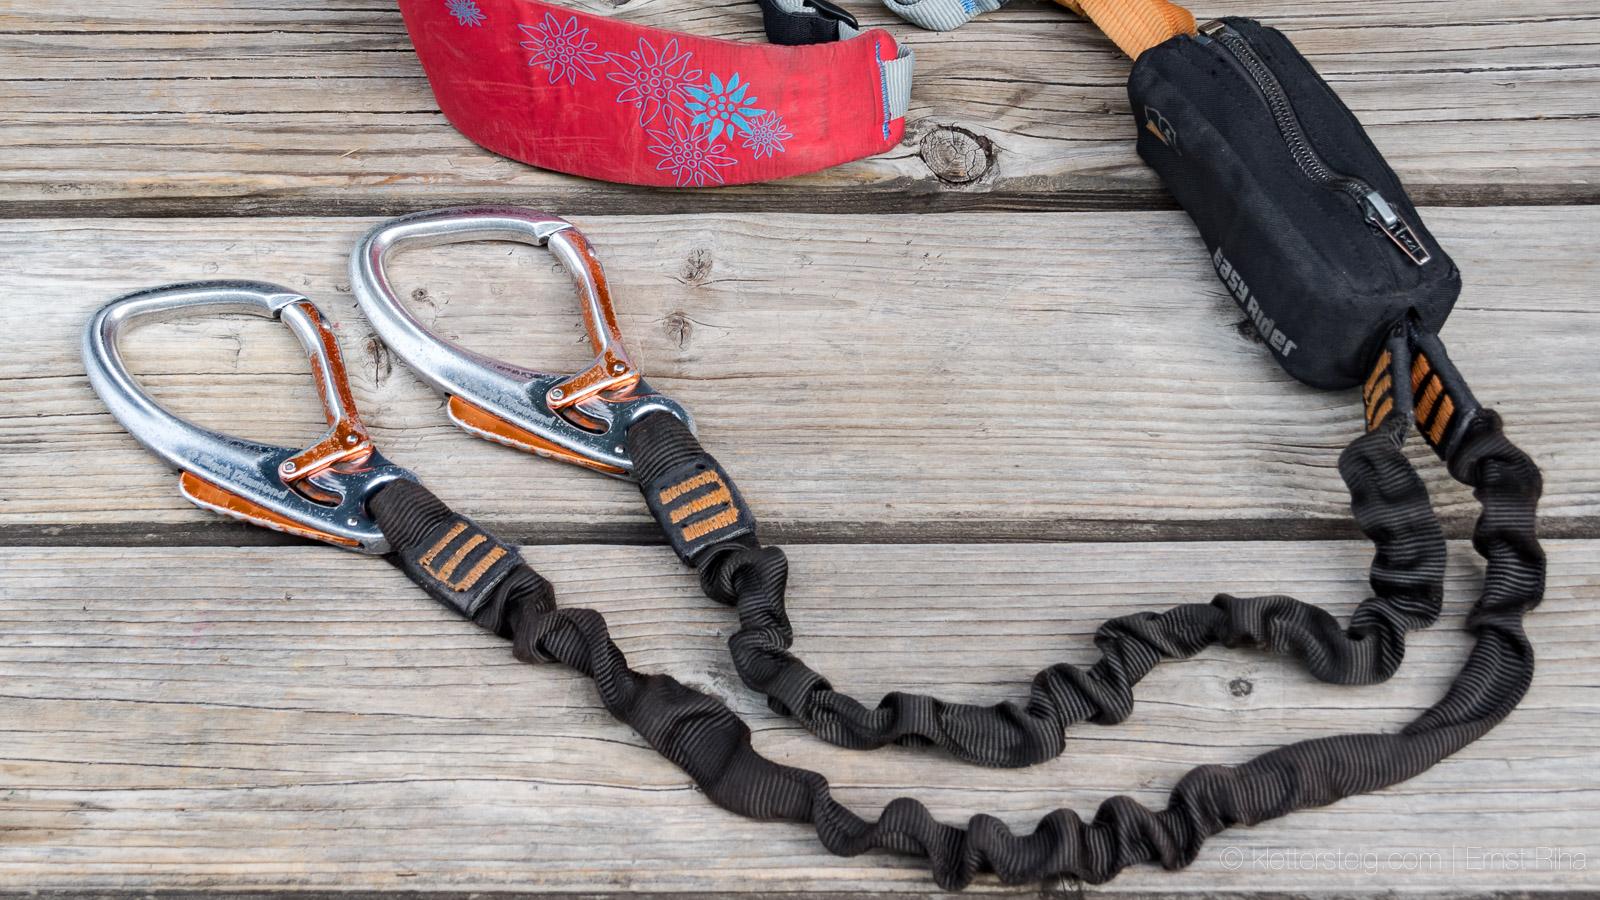 Klettersteigset Bandfalldämpfer : Klettersteigset bandfalldämpfer funktion: neue klettersteignorm